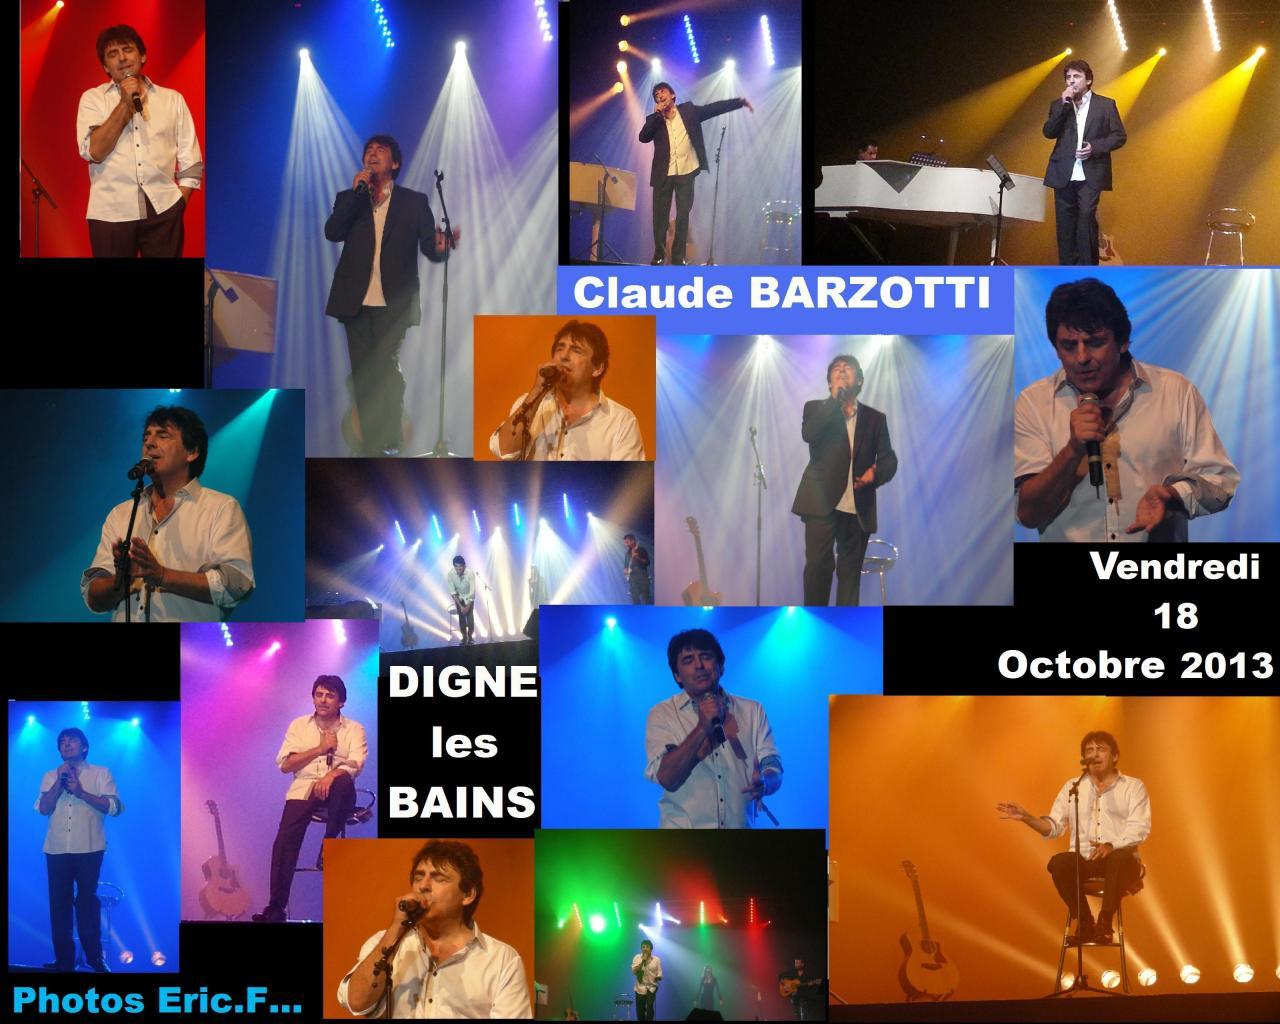 digne-les-bains-18-octobre-2013-claude-barzotti.jpg